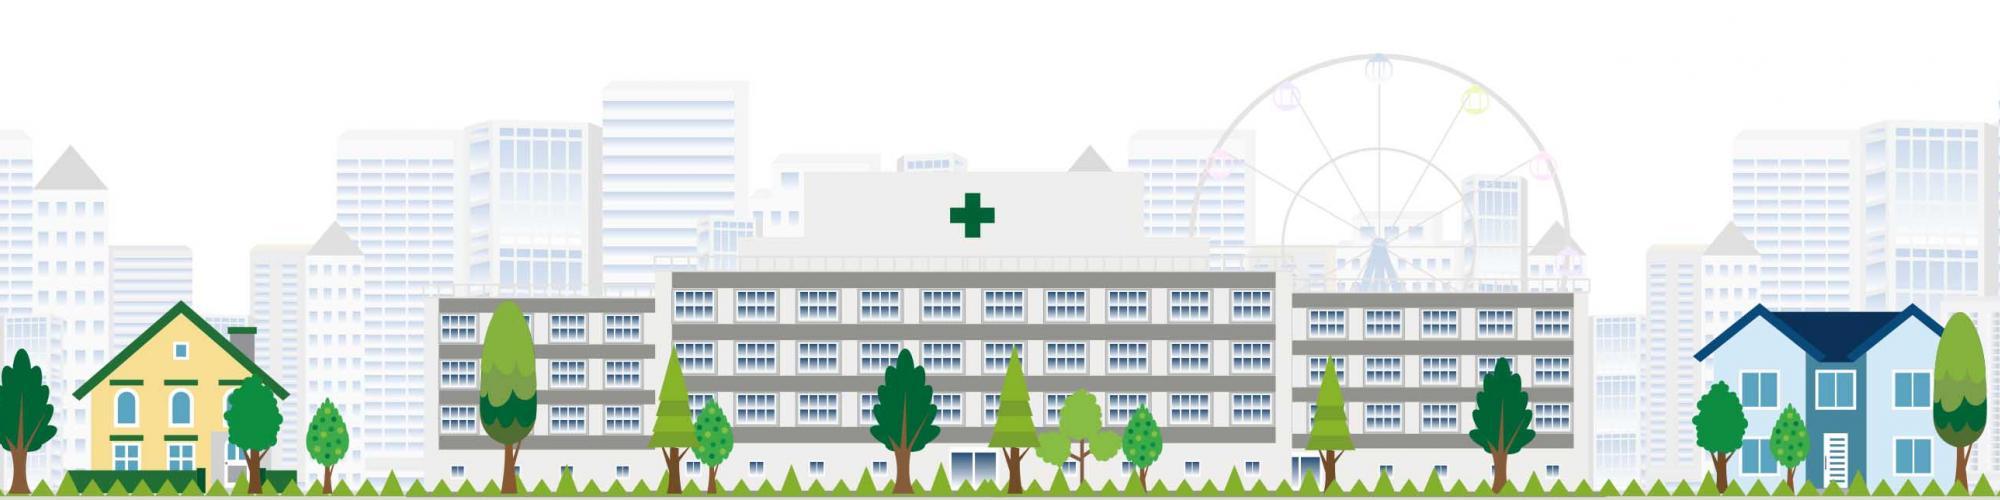 Helios Vogtland-Klinikum Plauen